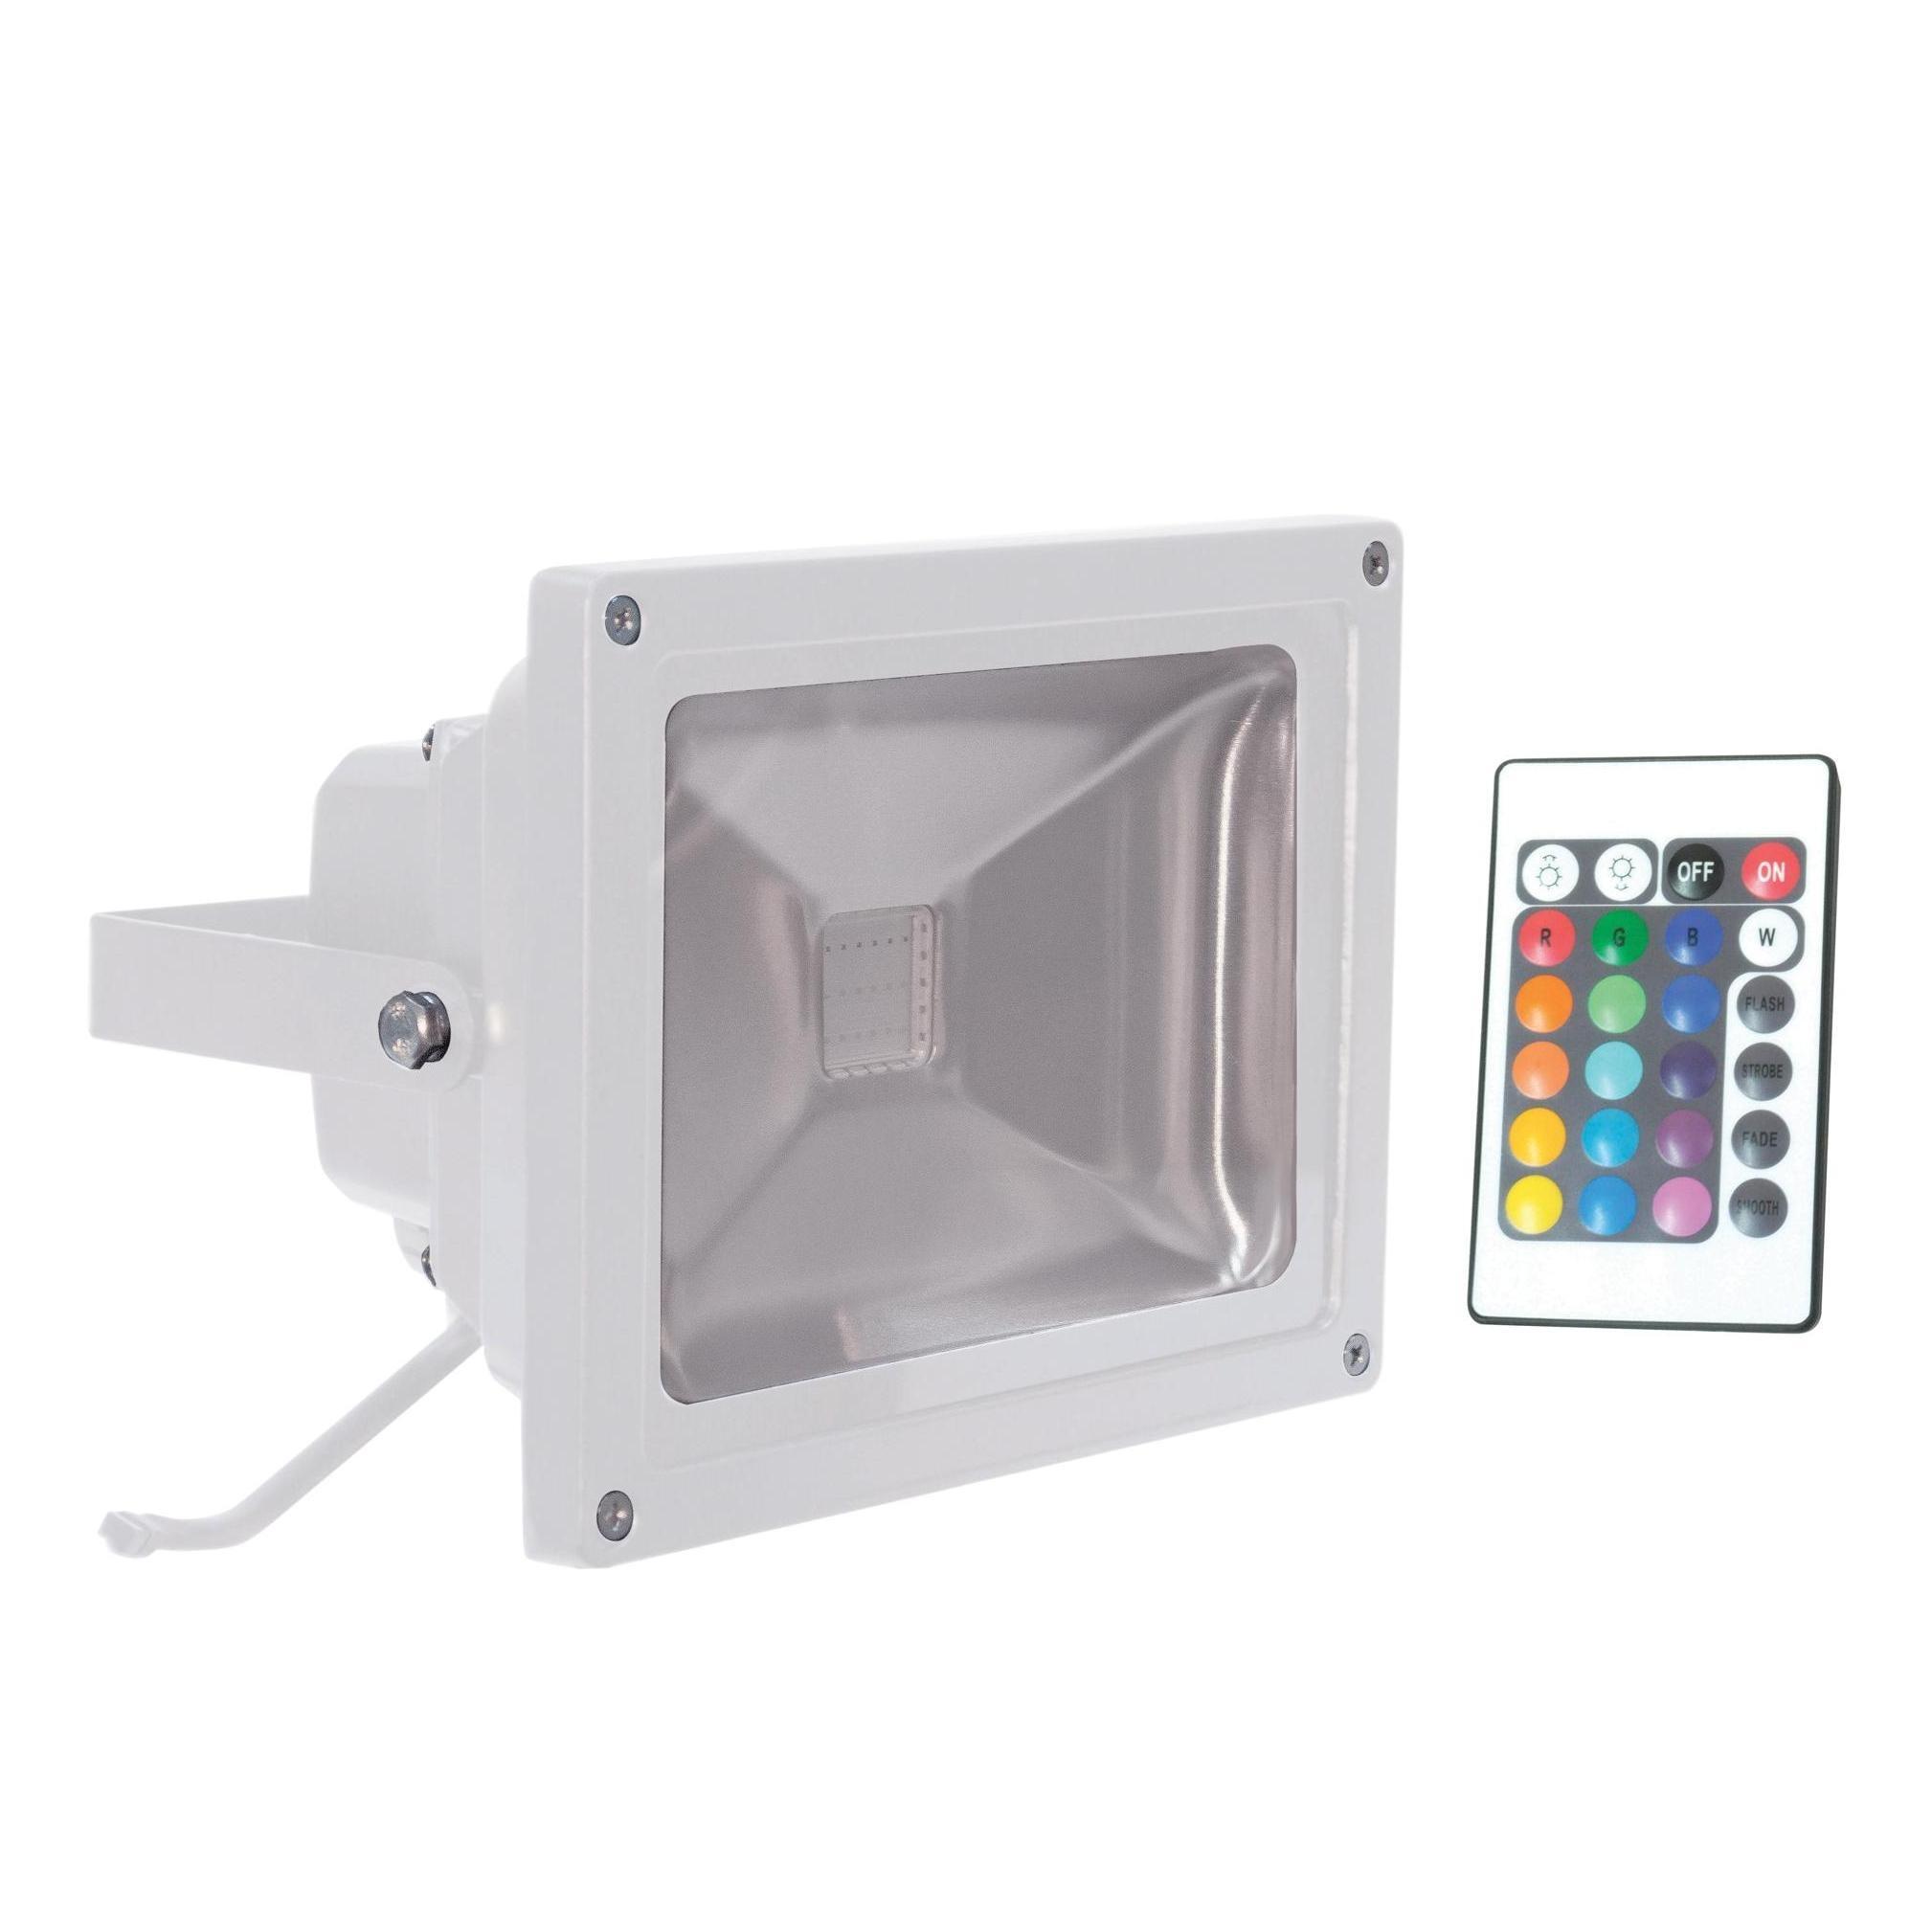 2 X Outdoor 20w RGB Coloured LED Flood Lights